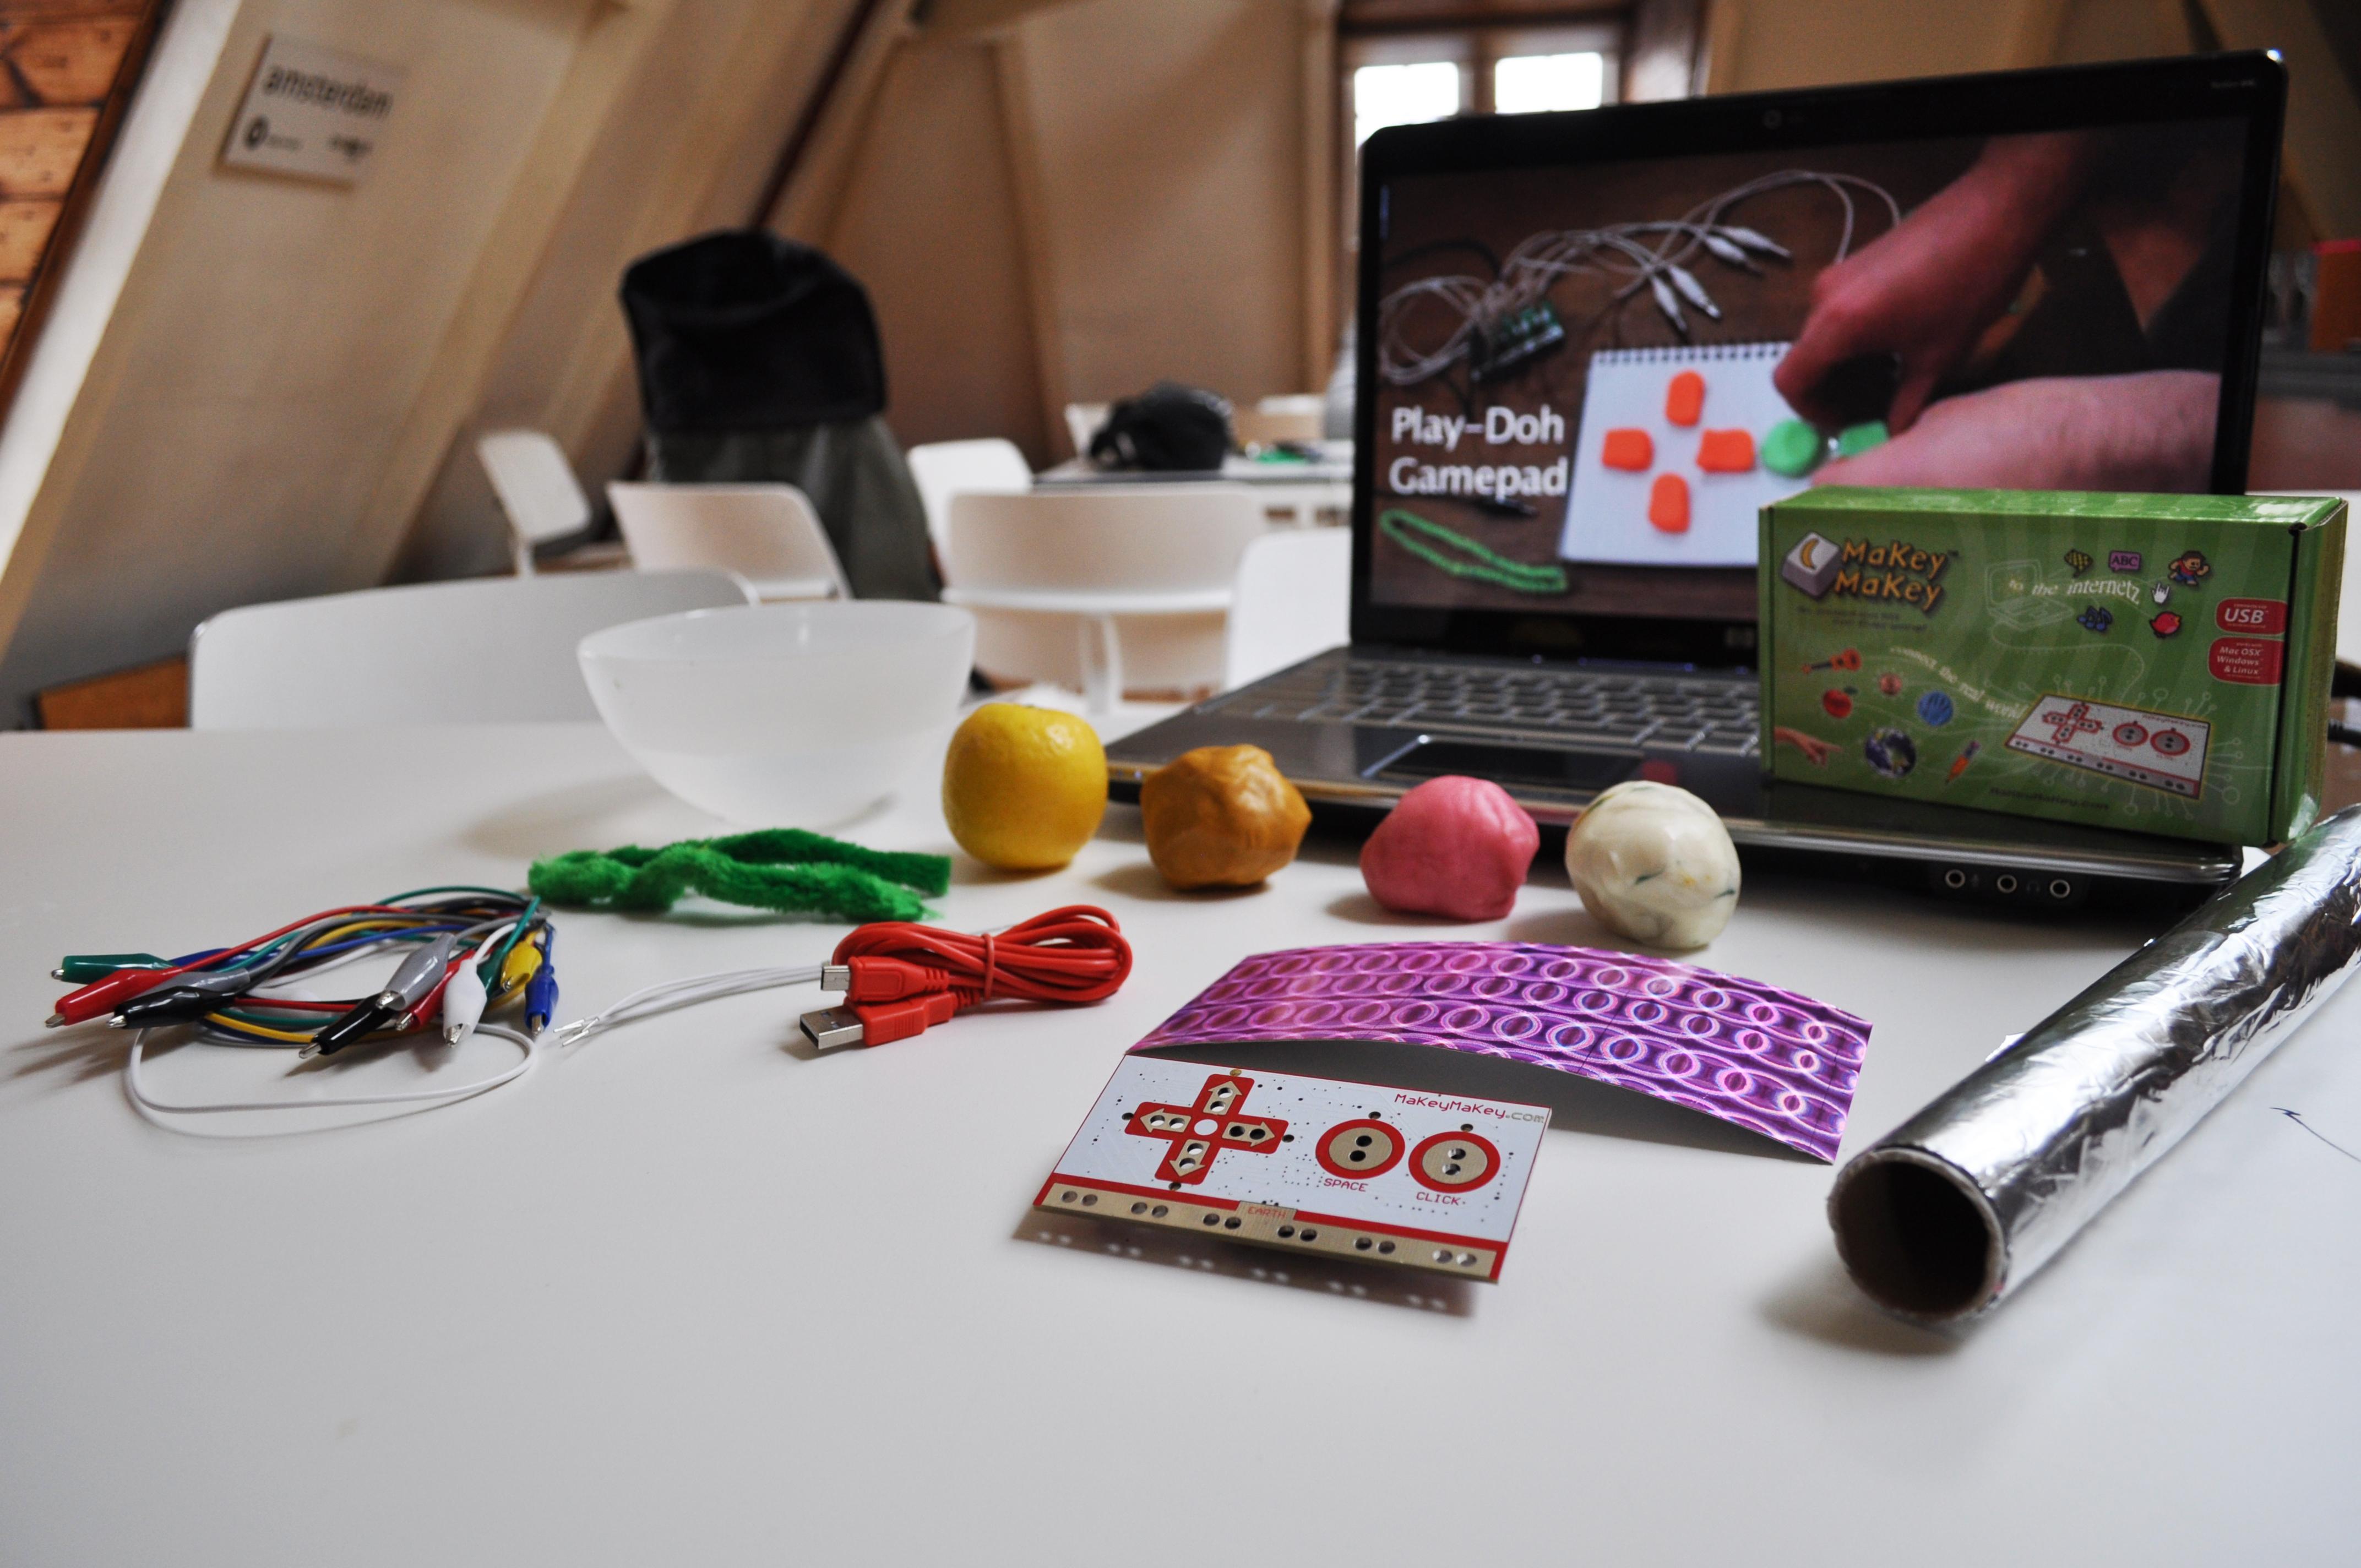 Picture of MaKey MaKey Experimenting / Experimenteer Met De MaKey MaKey